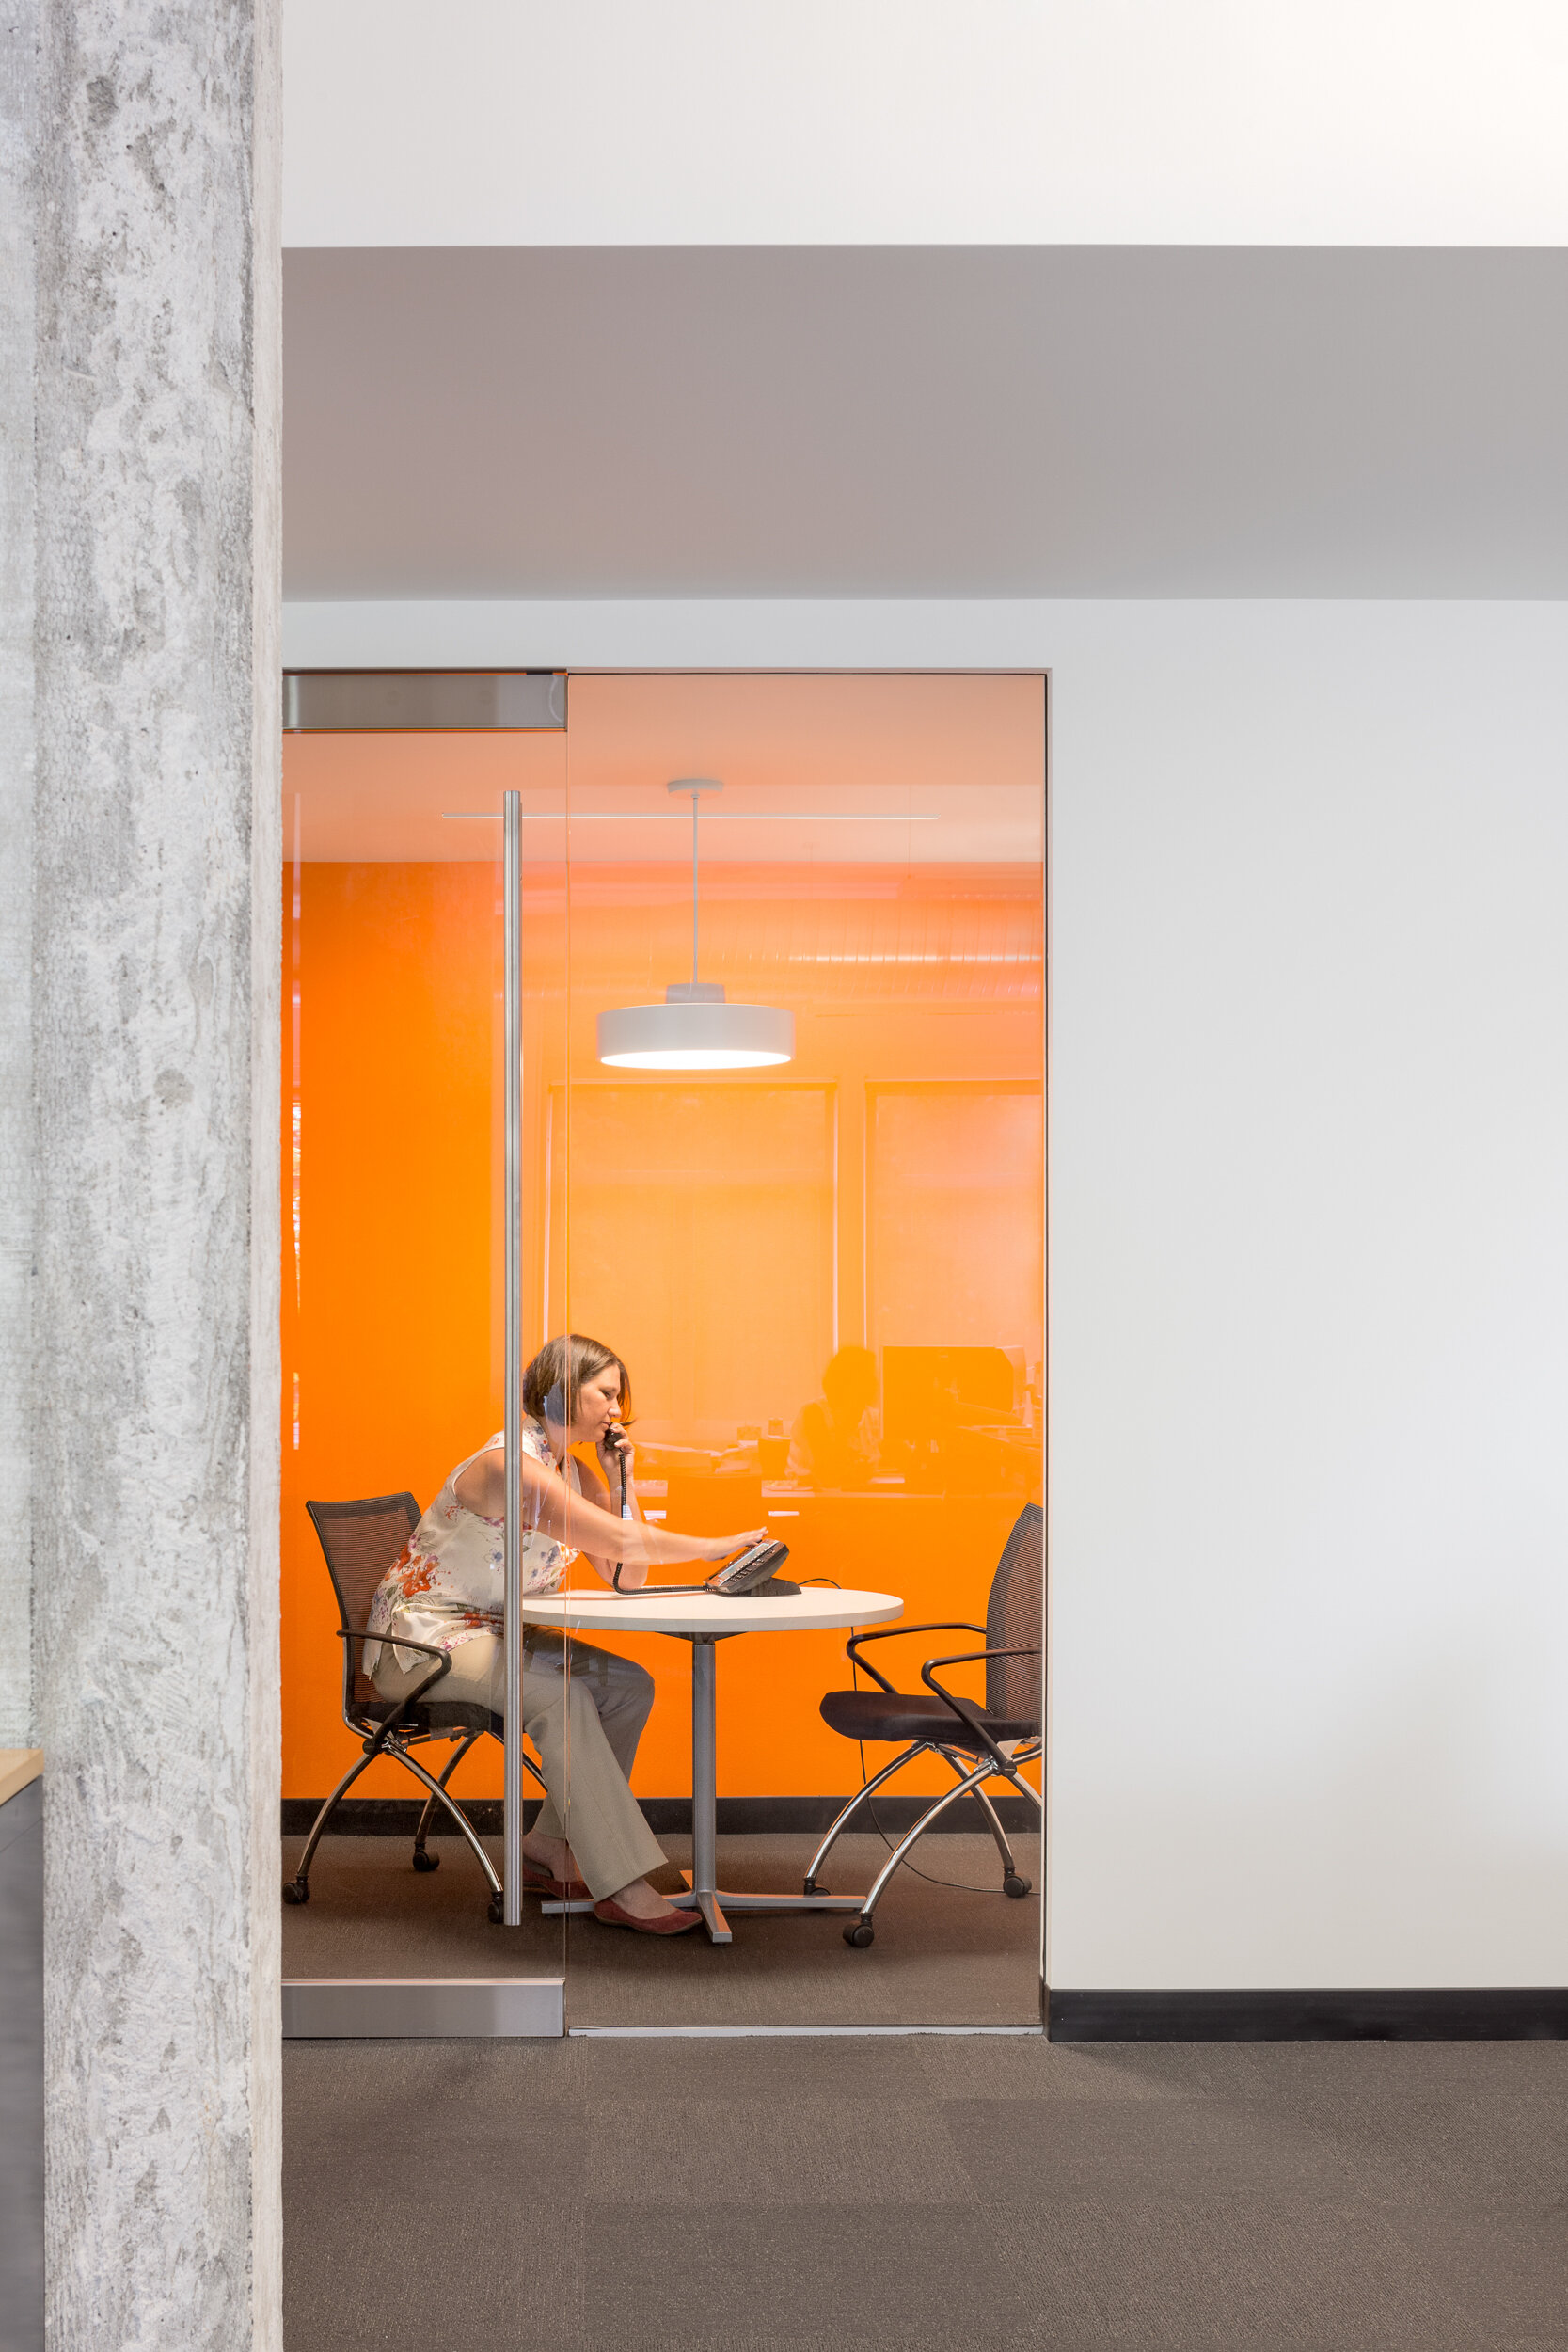 22-HEA-Office-JoshPartee-1407-phone-rm-michelle.jpg